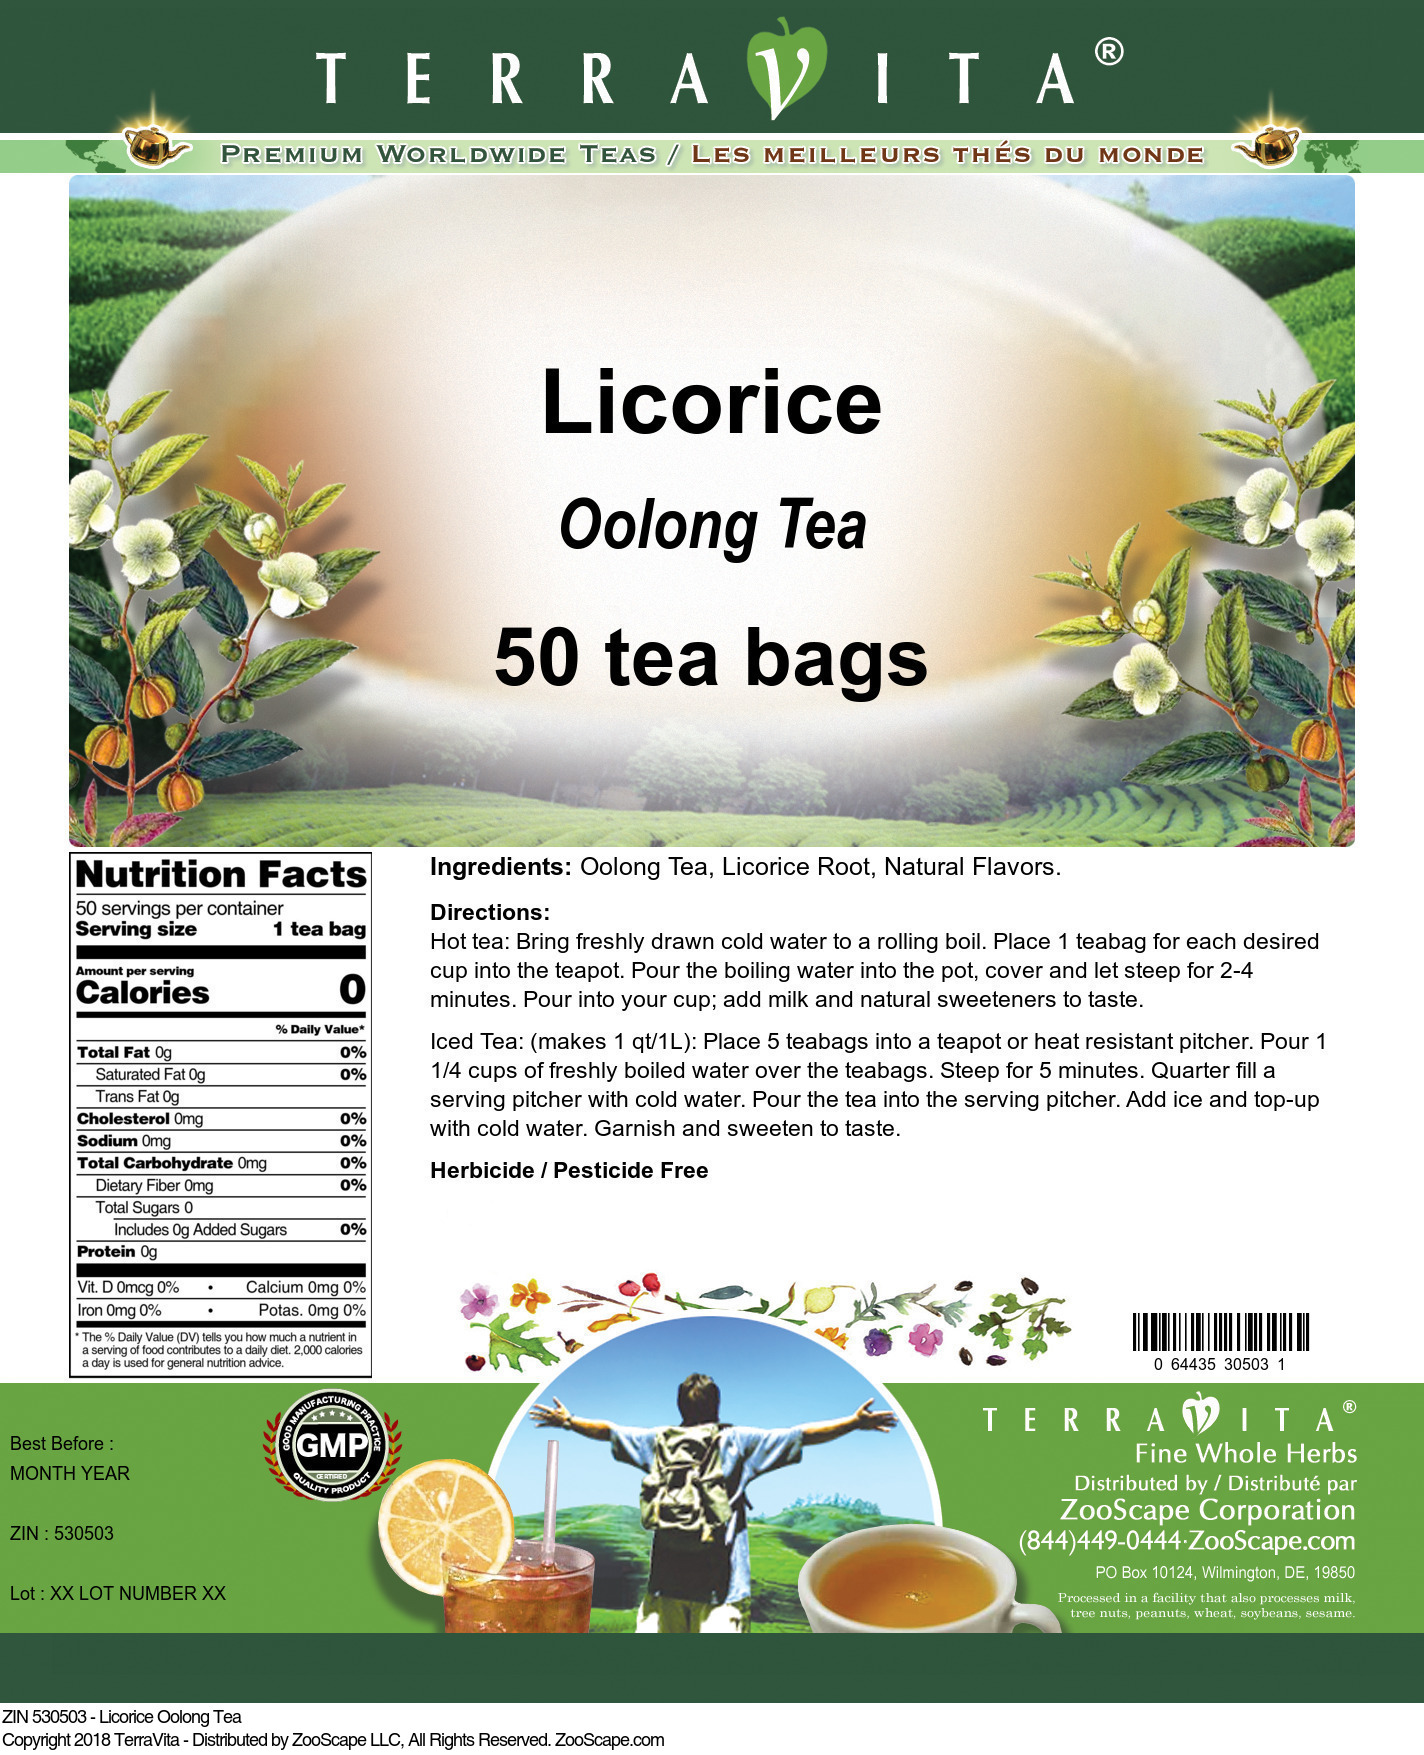 Licorice Oolong Tea